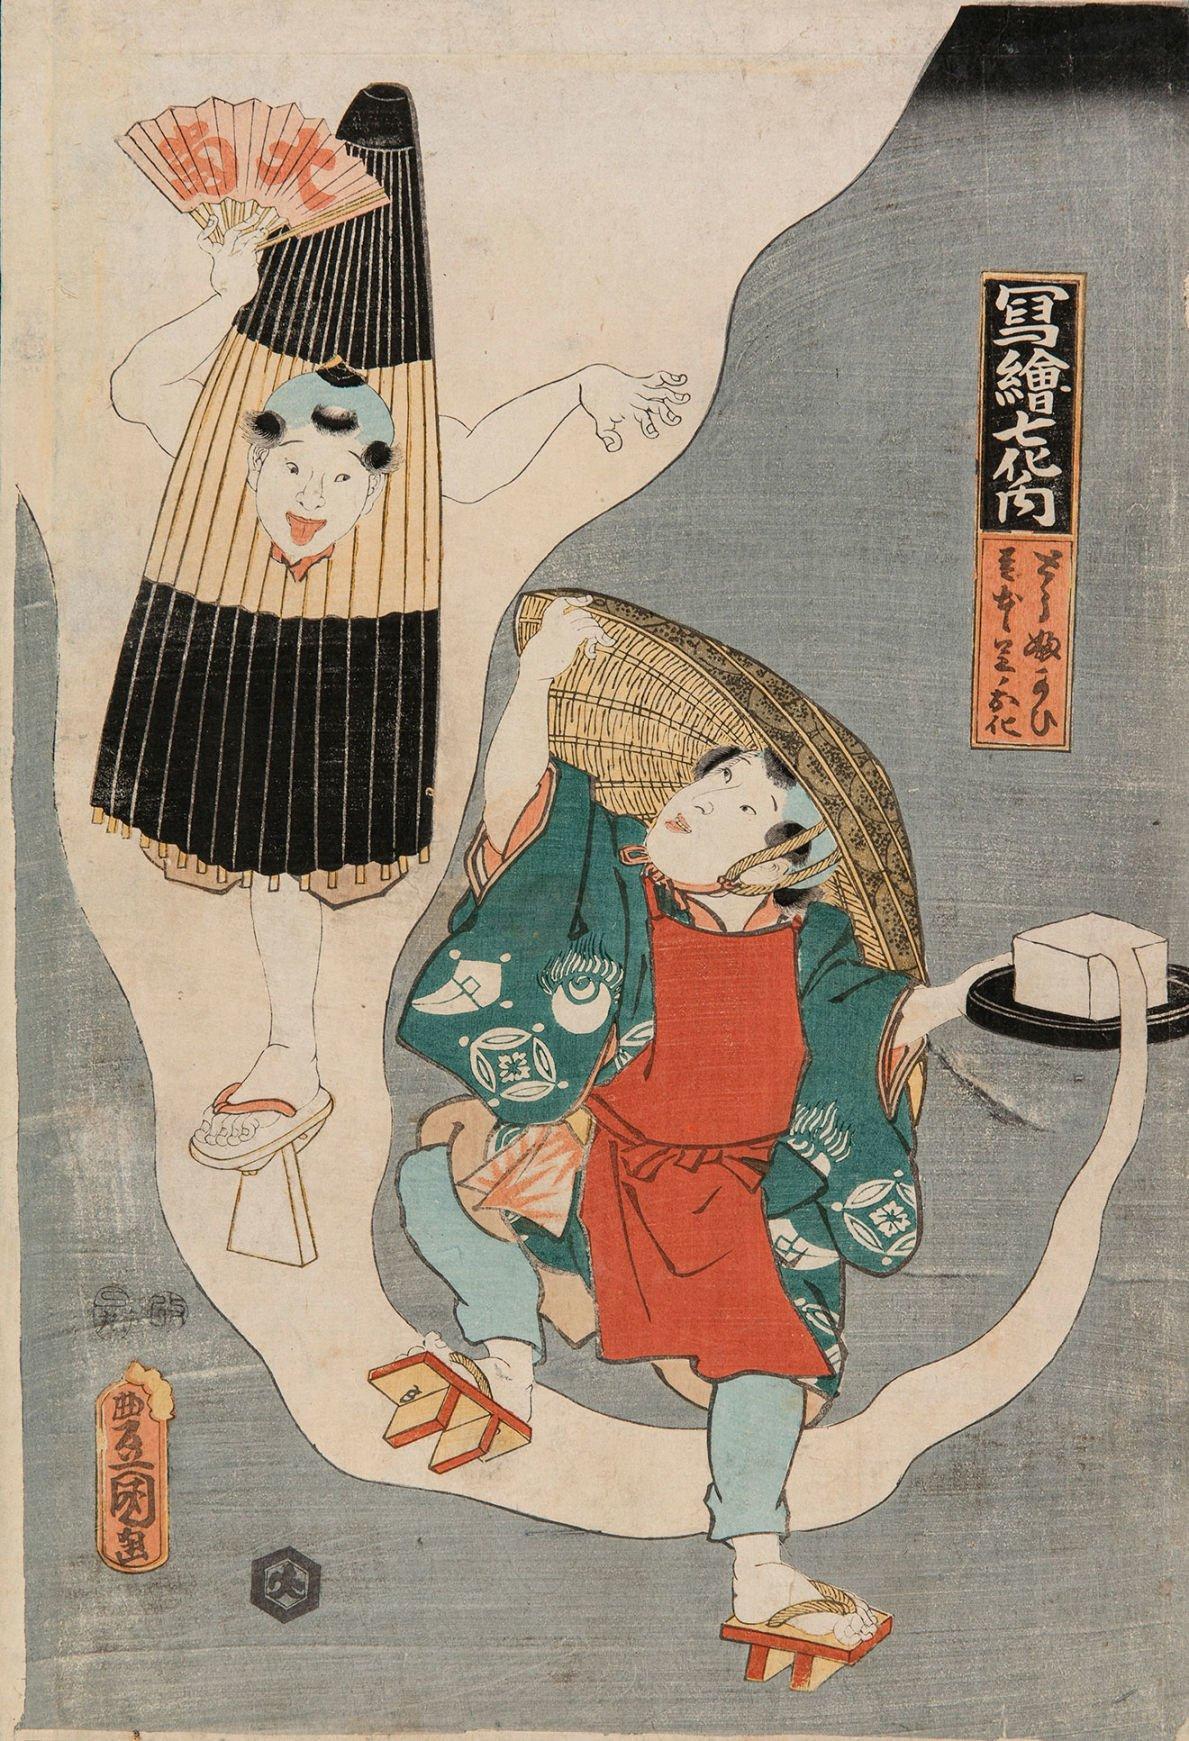 06 dec art yokai ghosts and demons of japan 2